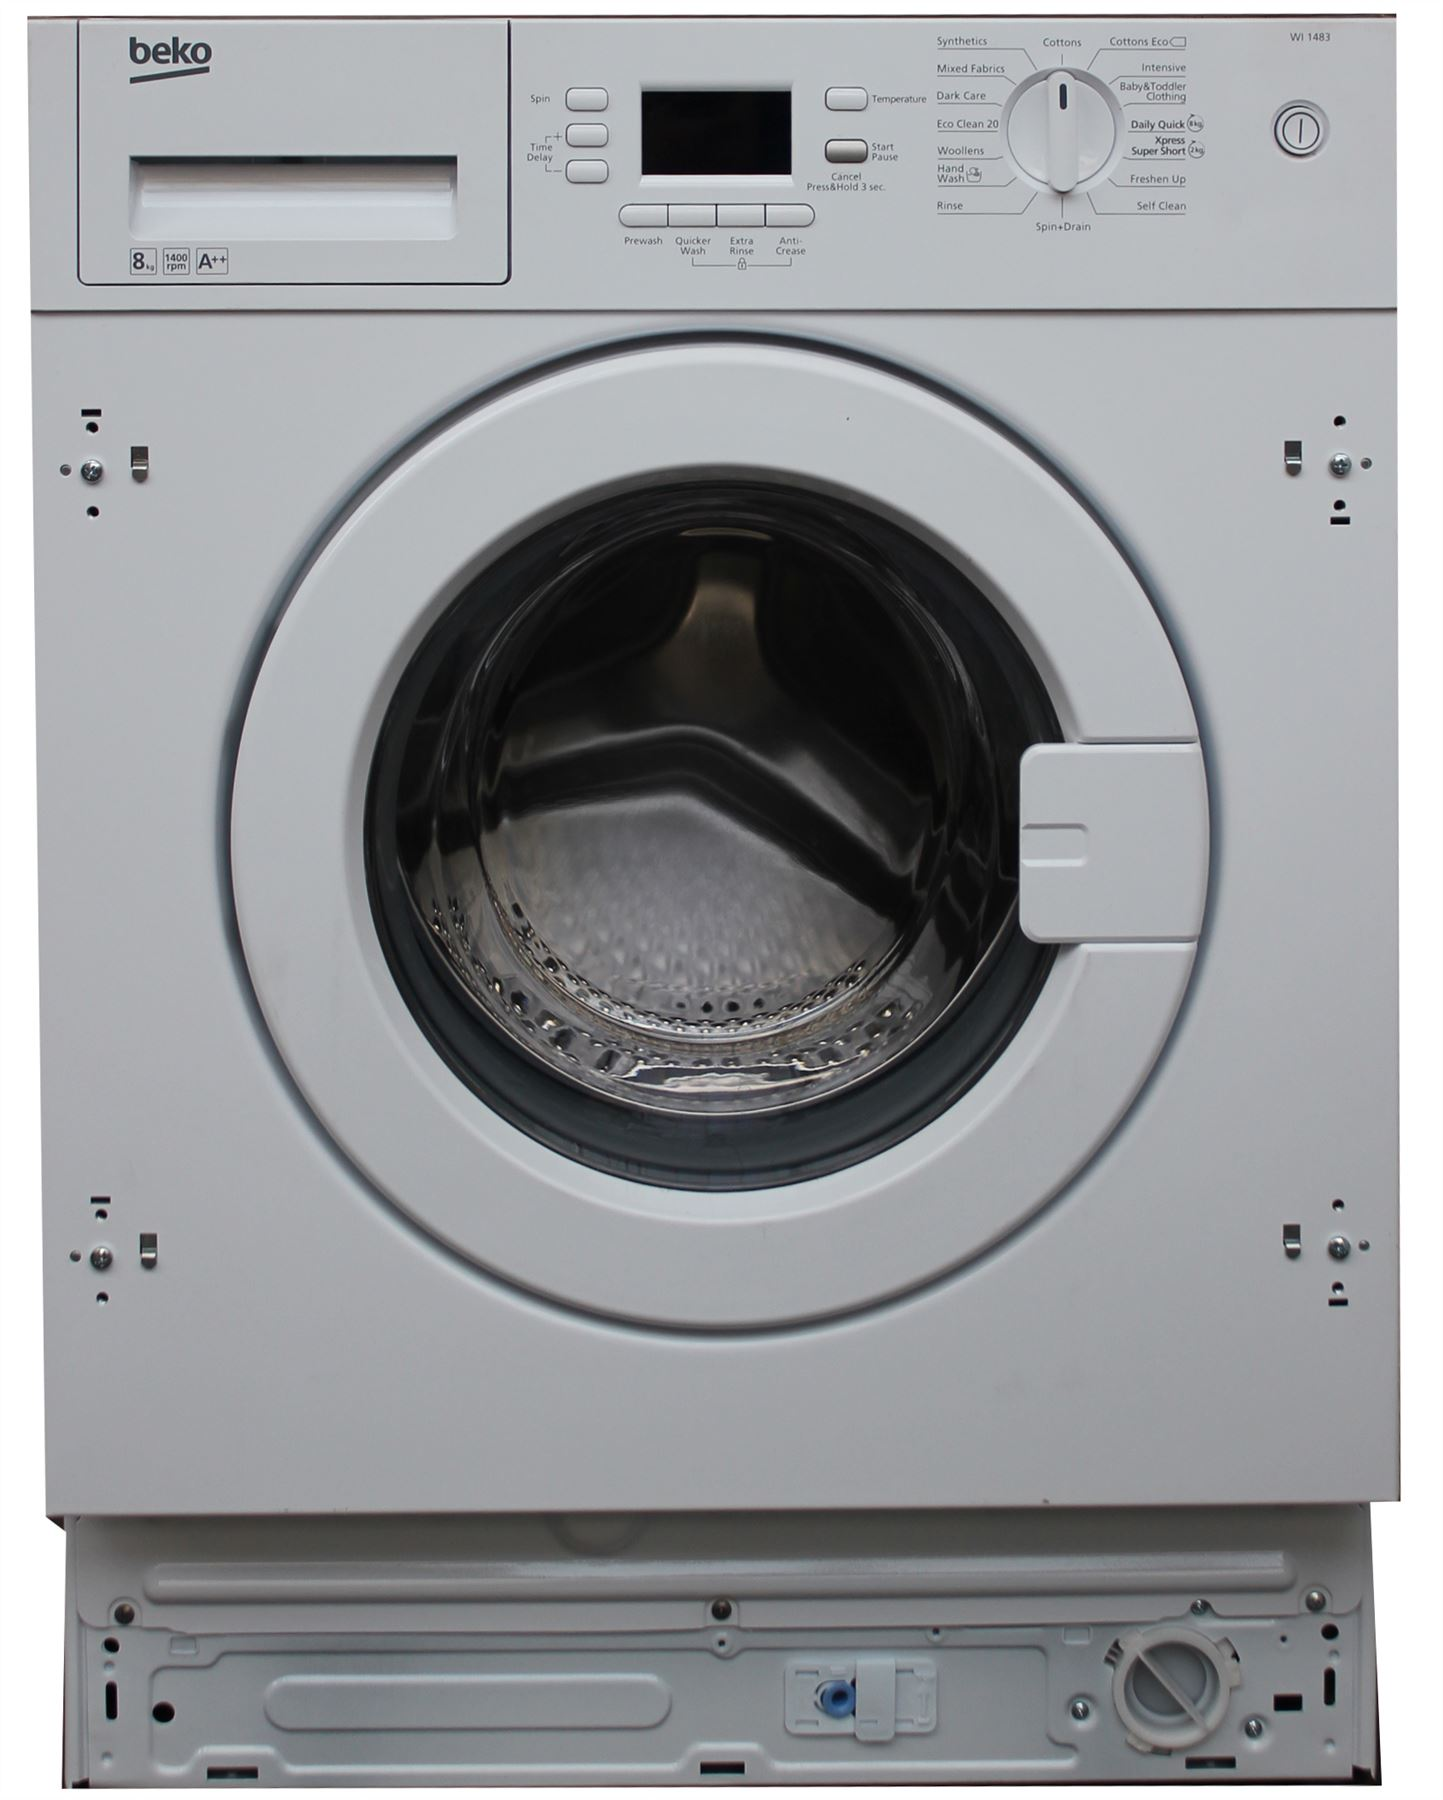 beko wi1483 integrated built in 8kg washing machine a. Black Bedroom Furniture Sets. Home Design Ideas